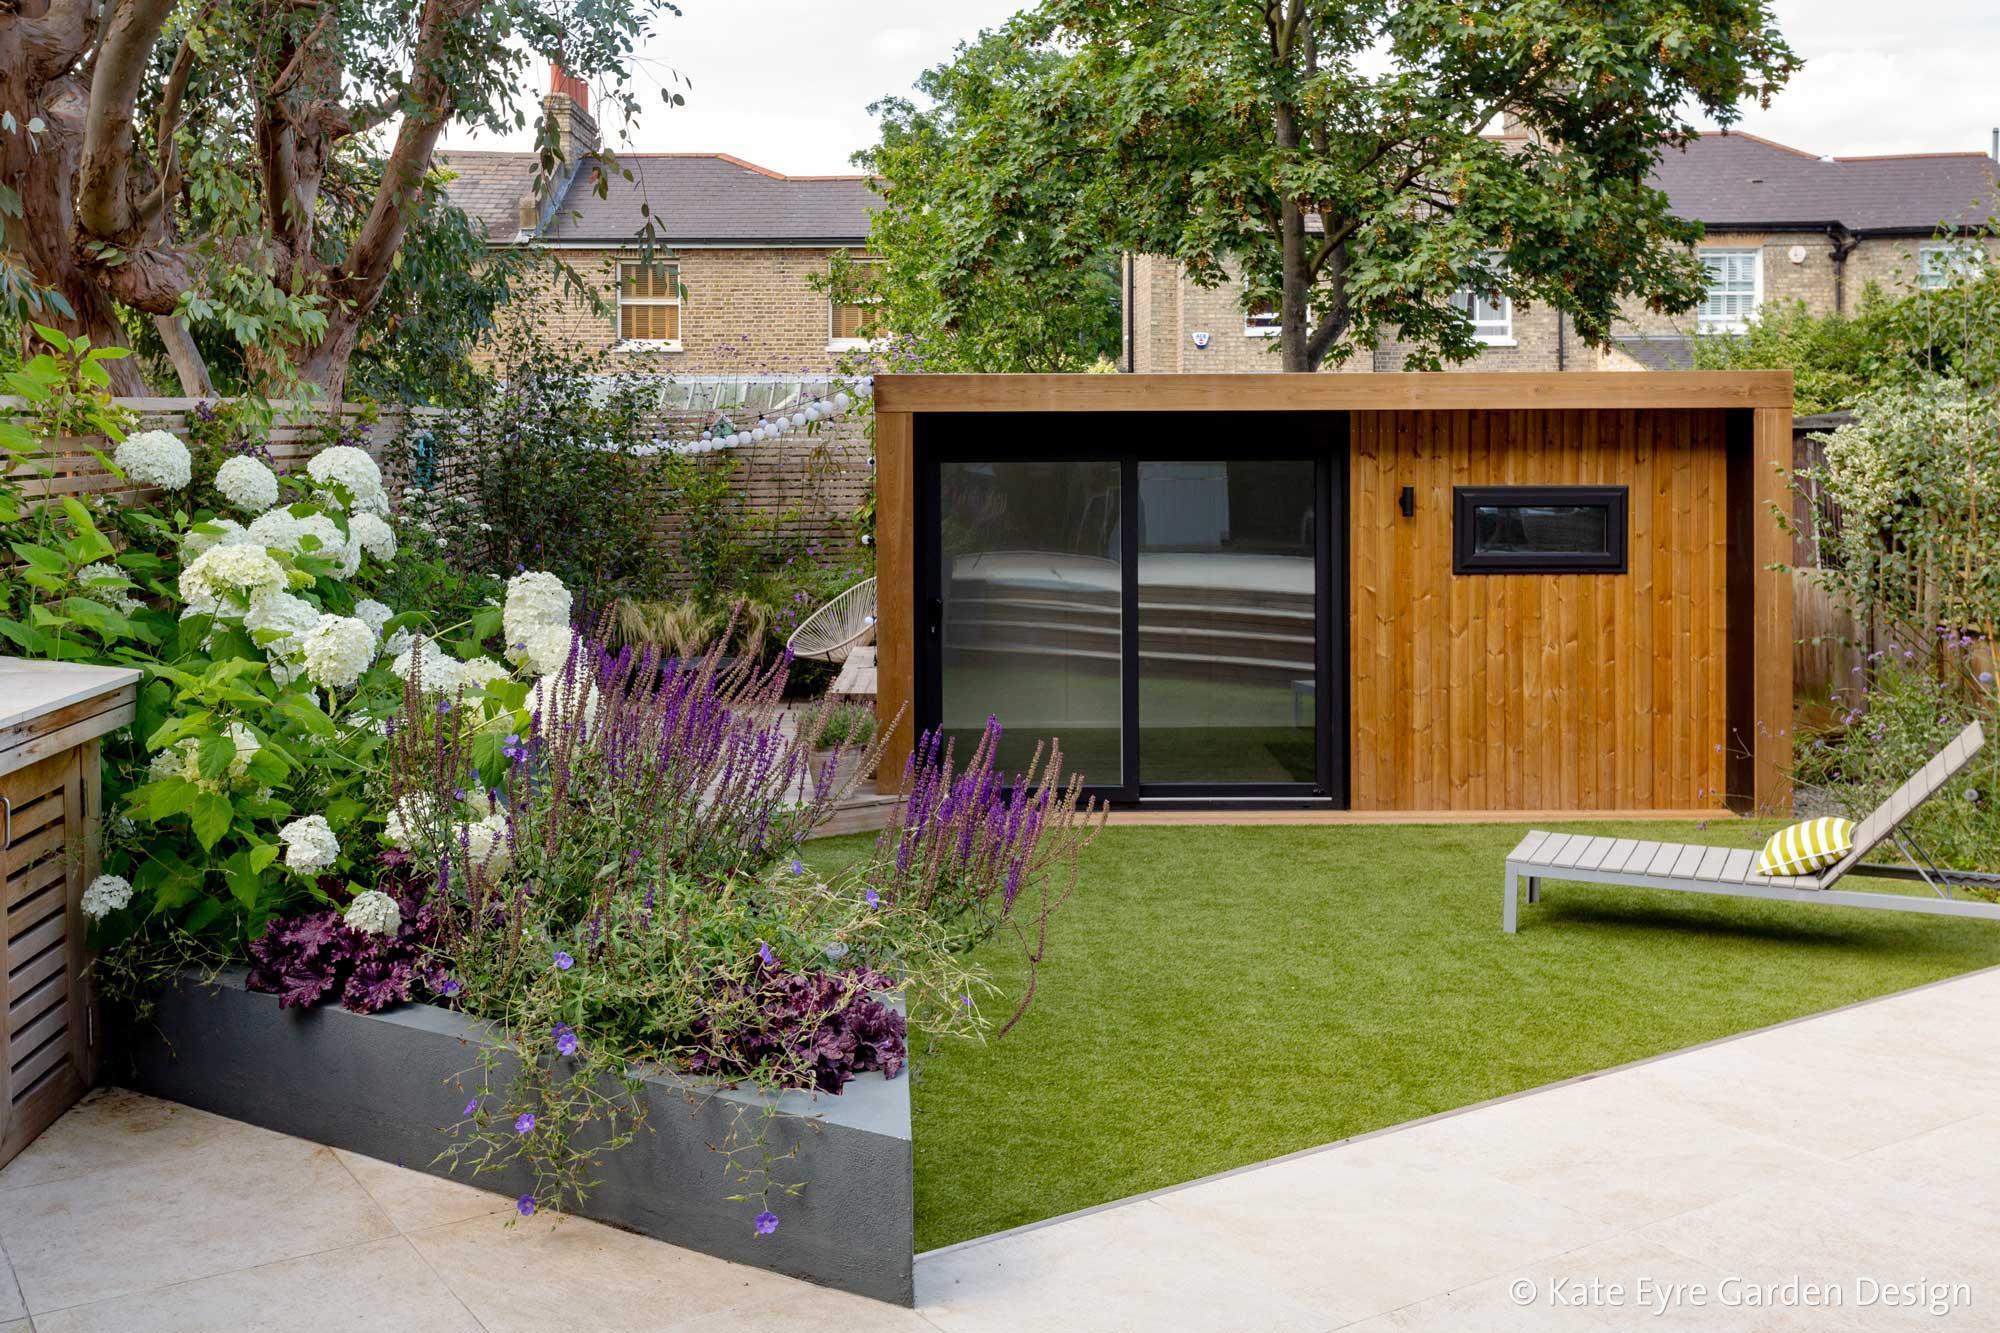 Ildersly Grove 5: lawn, outdoor room & raised planter